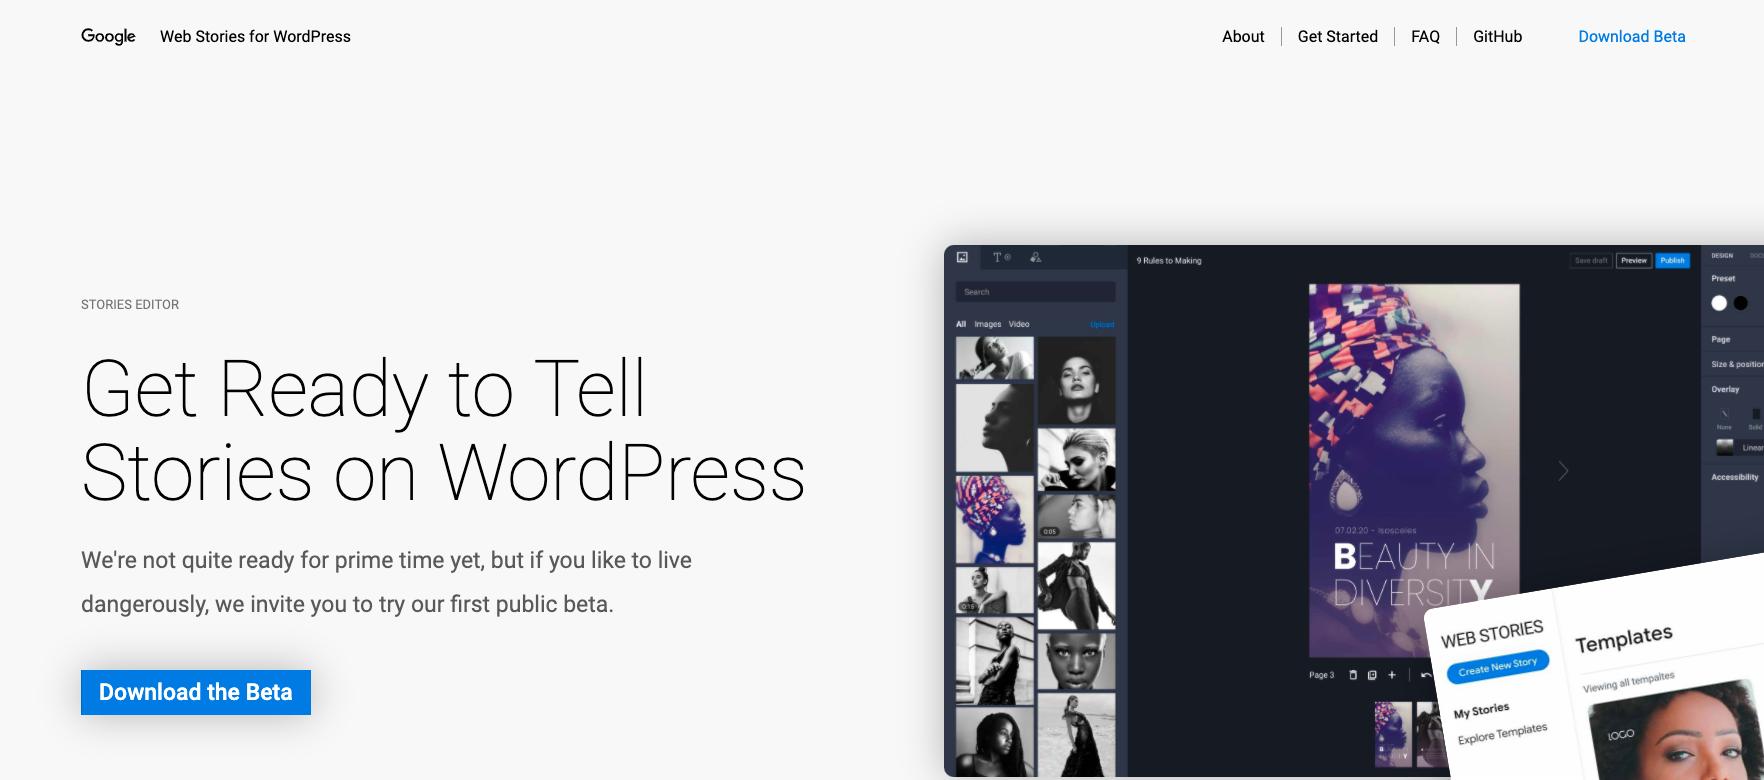 google-web-stories-wordpress